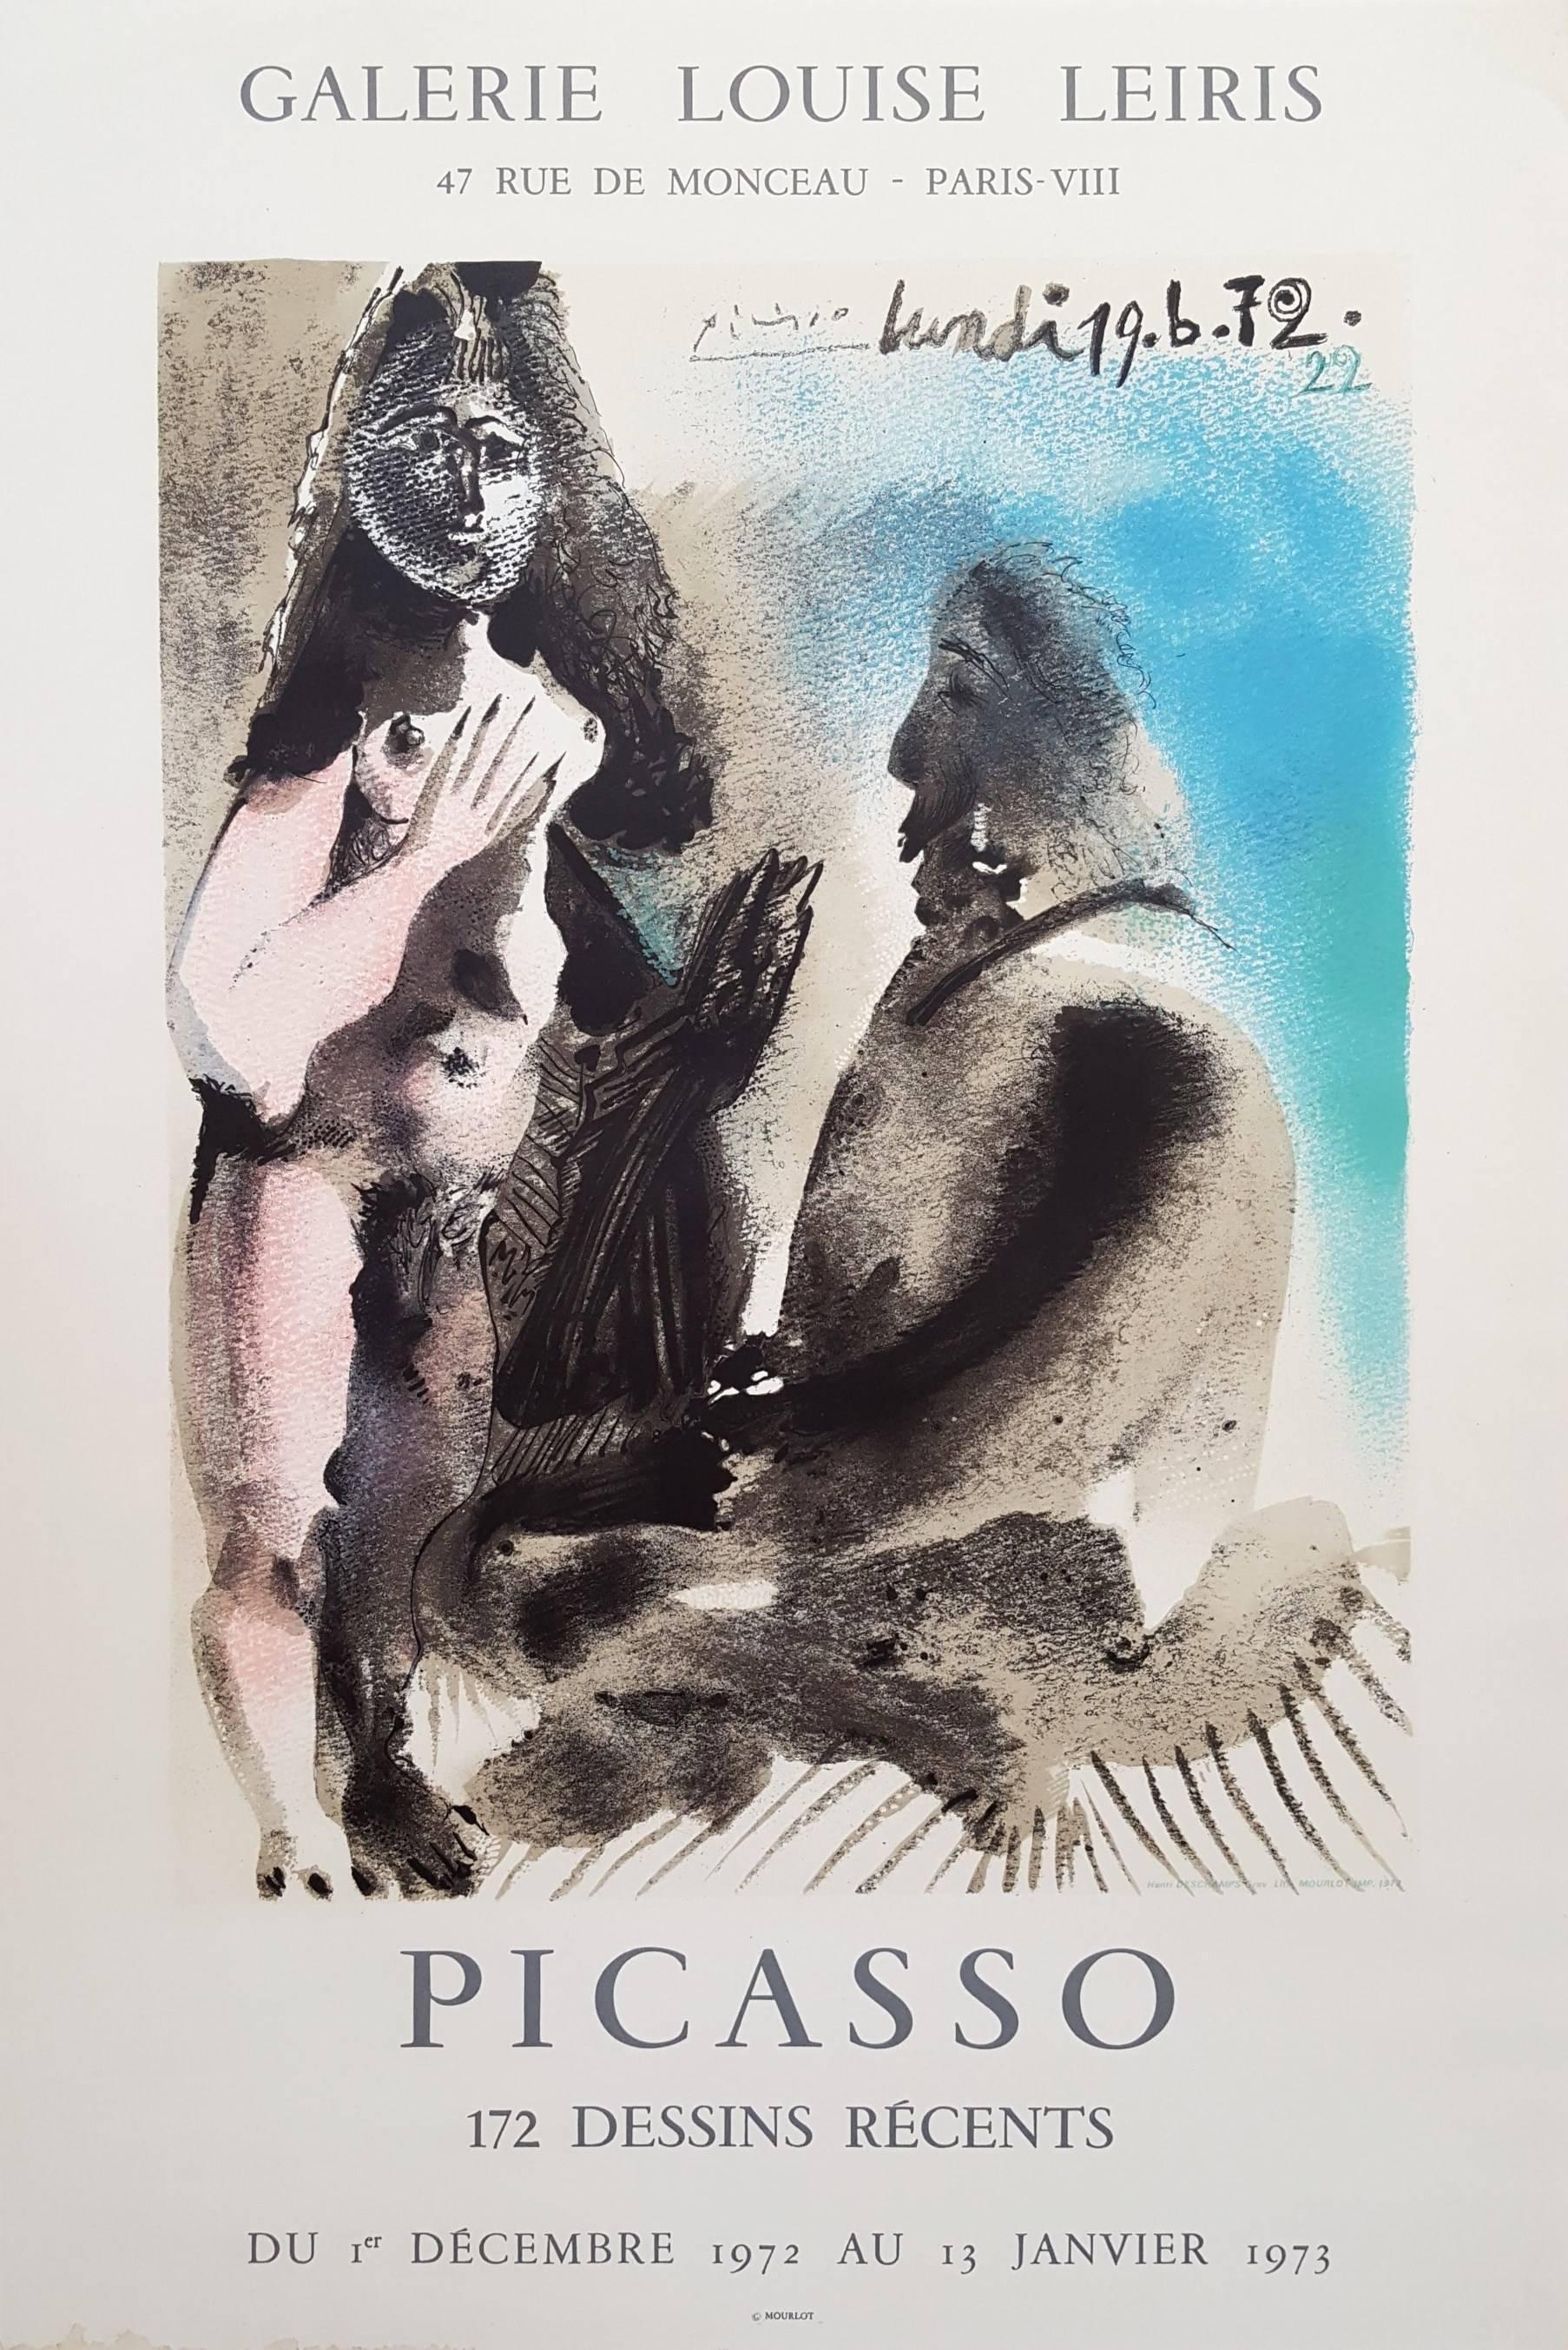 Galerie Louis Leiris: The Painter & His Model